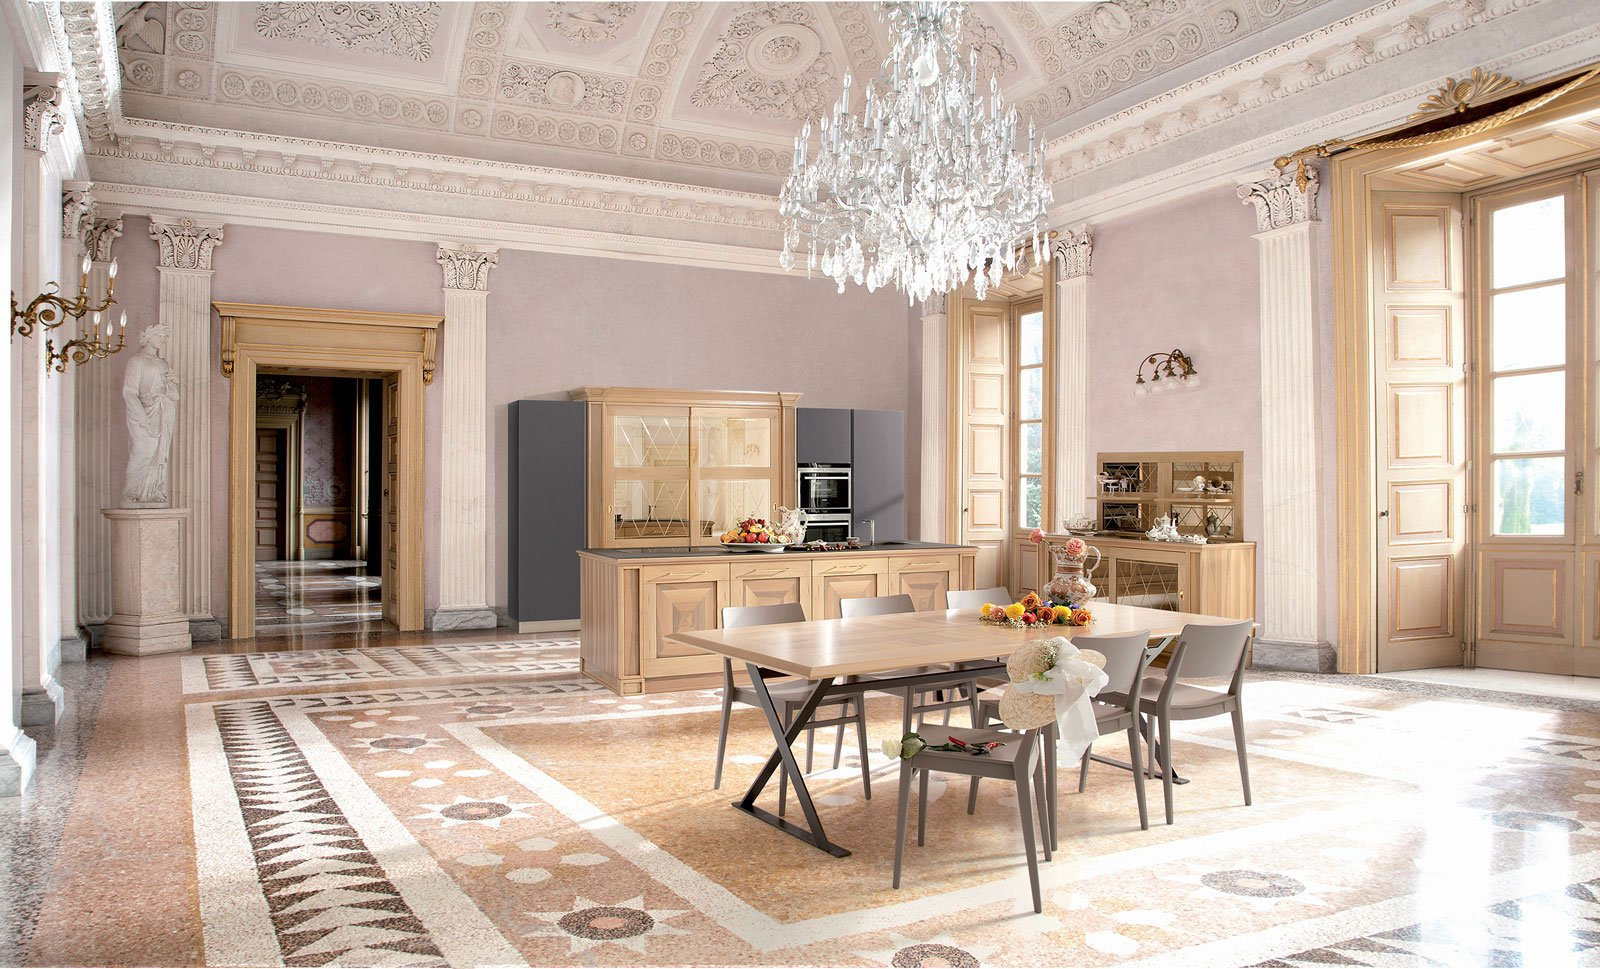 Cucine classiche in legno o laccate cose di casa for Cucine classiche